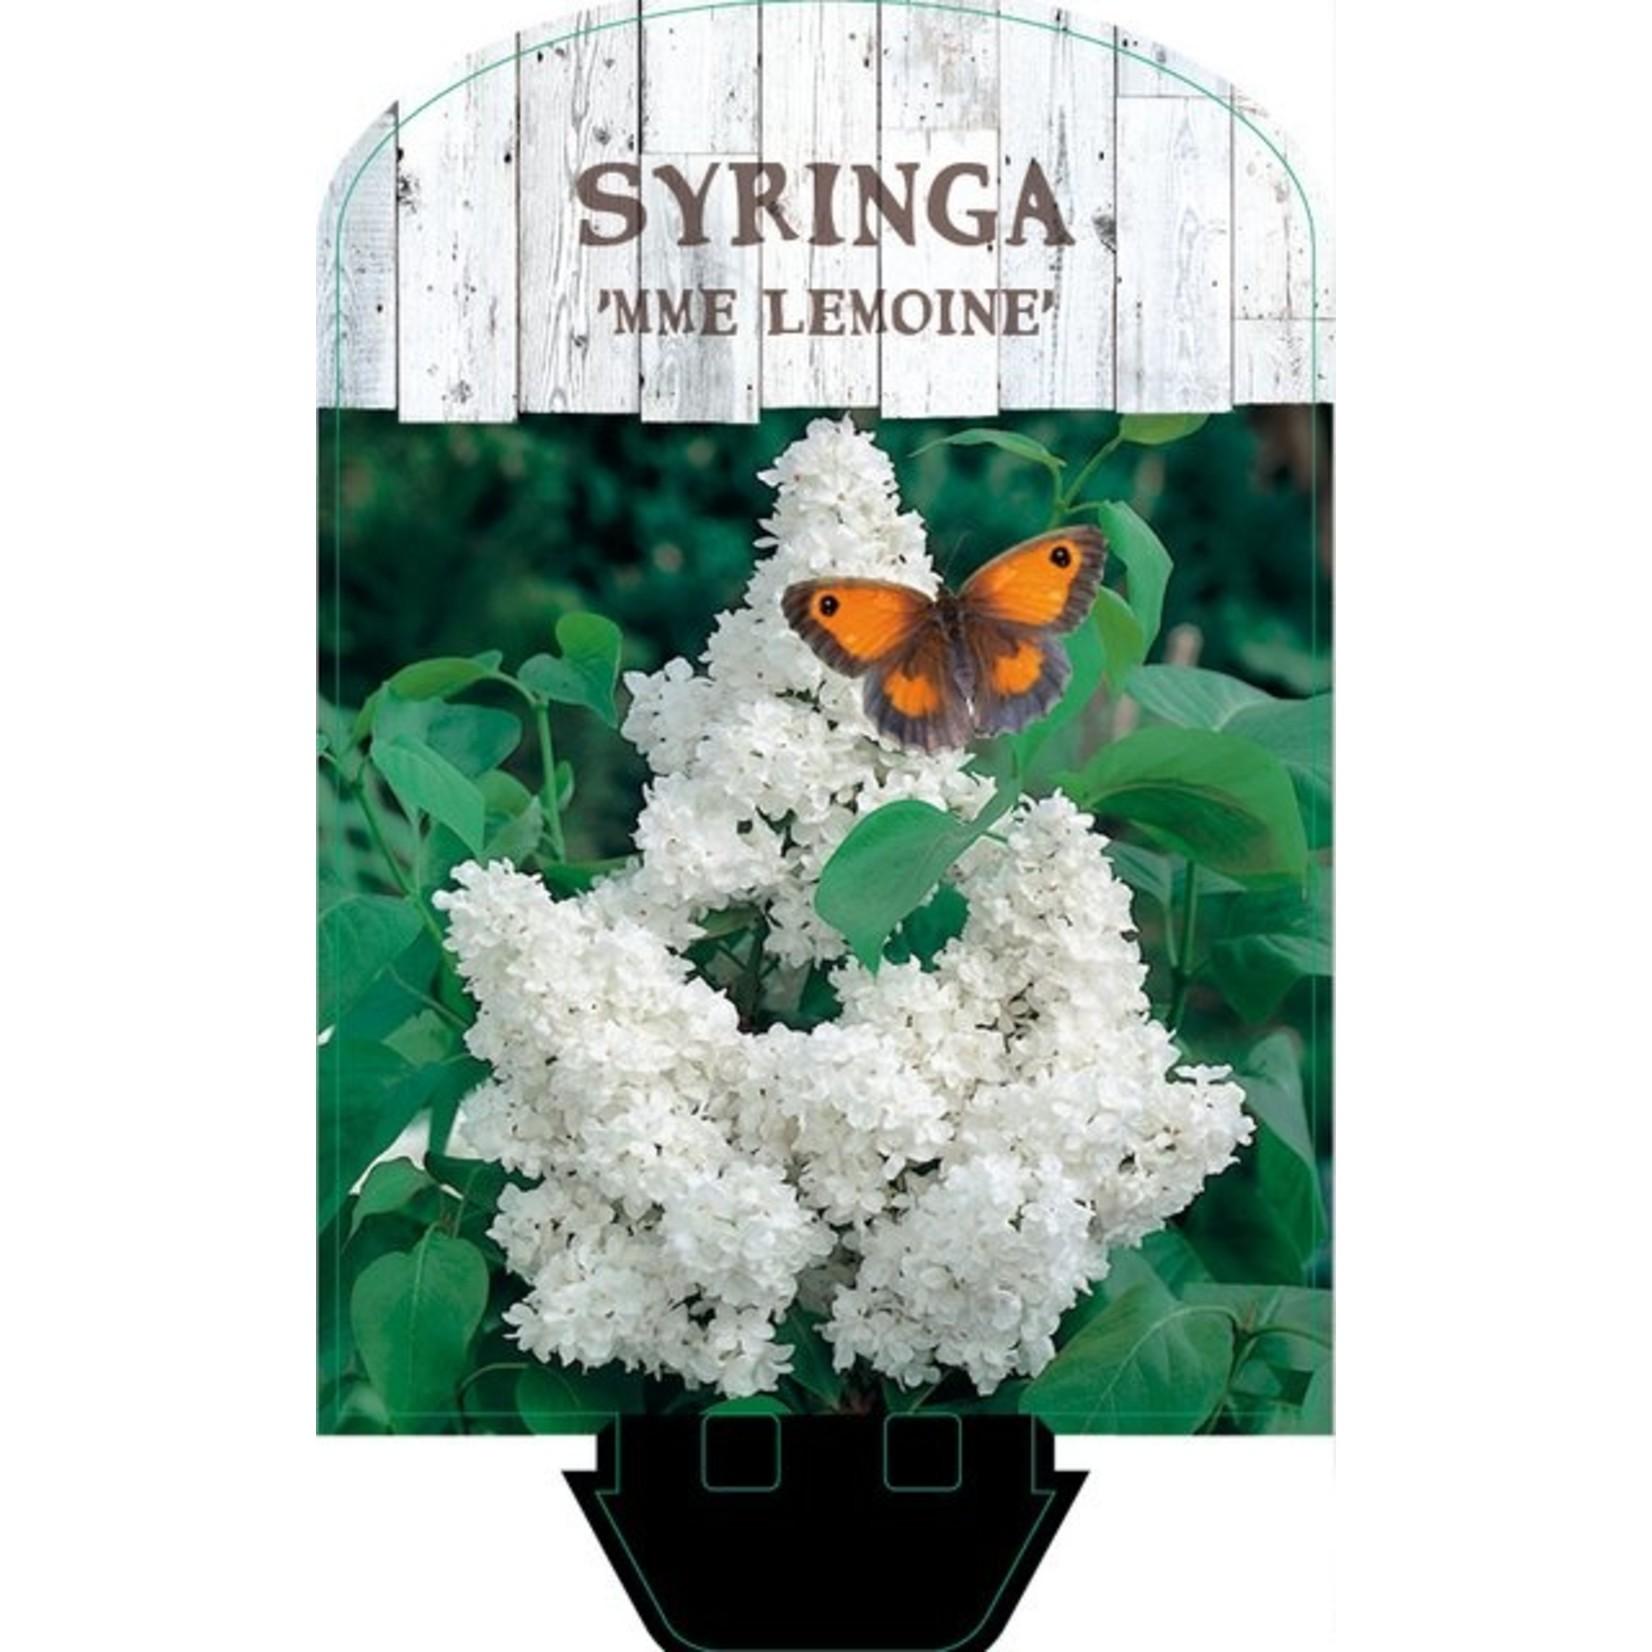 Syringa vulgaris 'Mme Lemoine' (Sering)